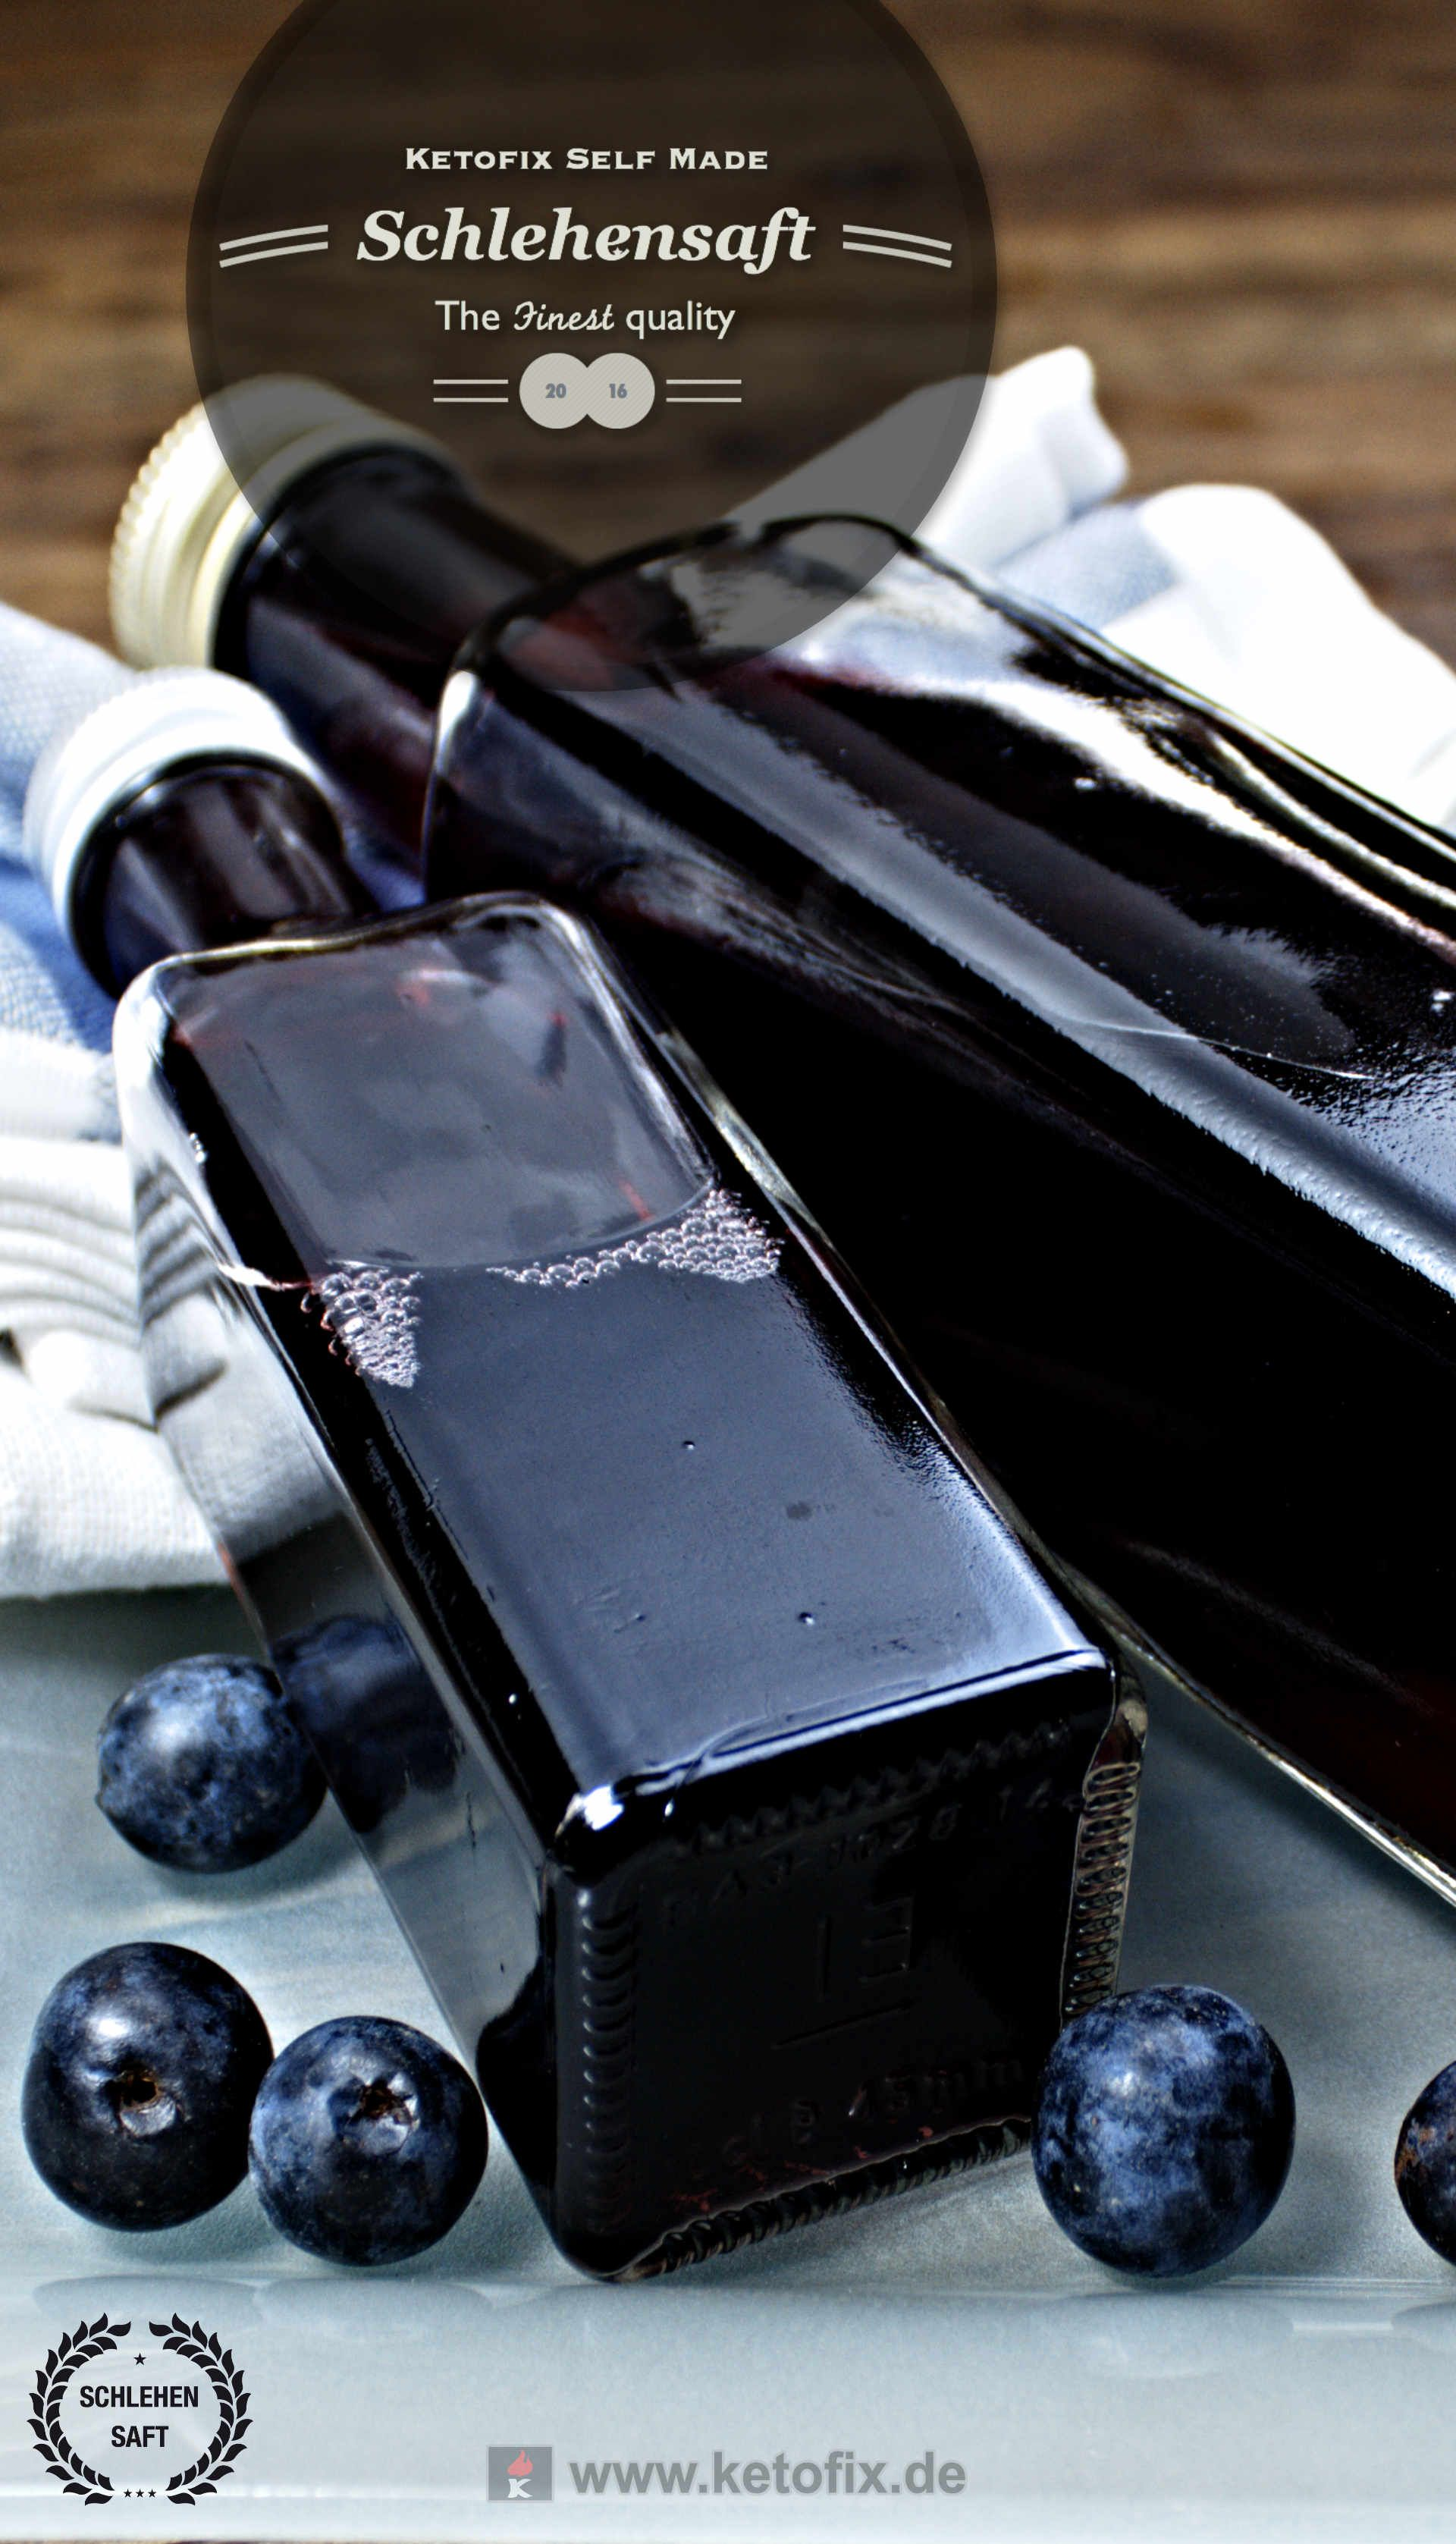 schlehensaft rezept rezept rezepte ohne kohlenhydrate saft schlehen und rezepte. Black Bedroom Furniture Sets. Home Design Ideas